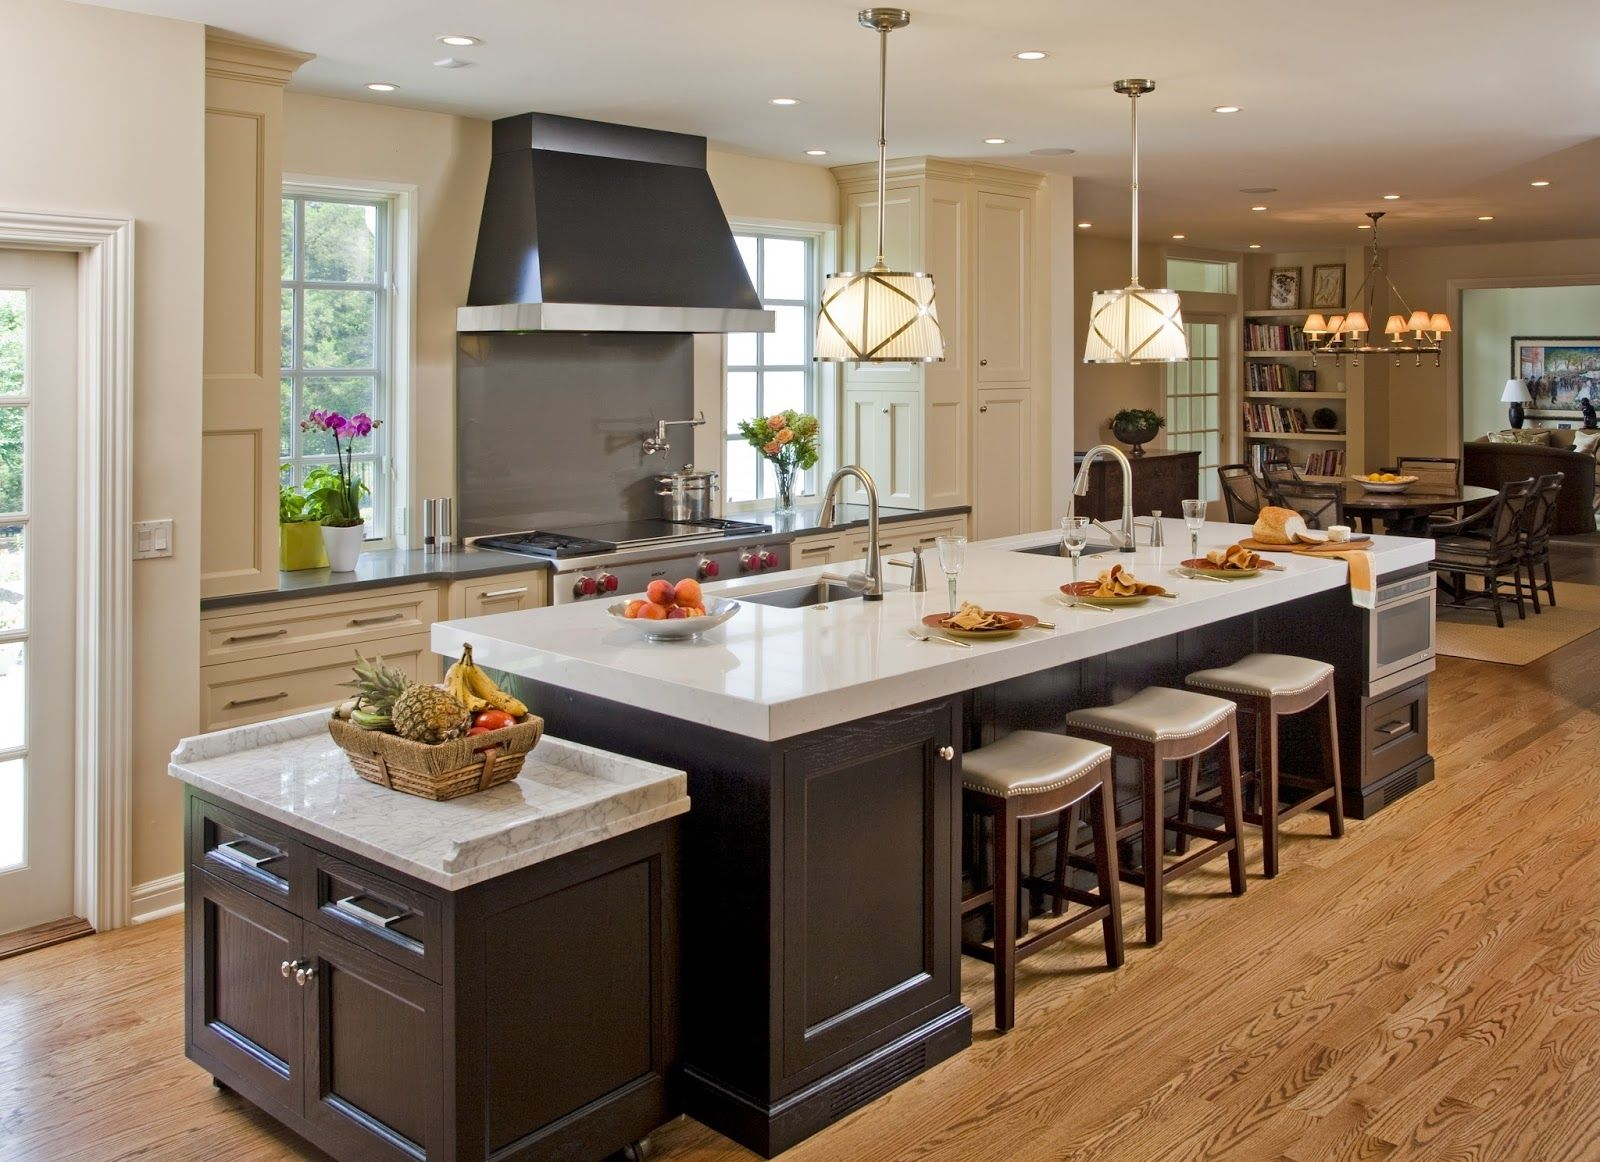 Kitchen  Luxury Photography   KouraJewels   Kosher kitchen, Kosher ...